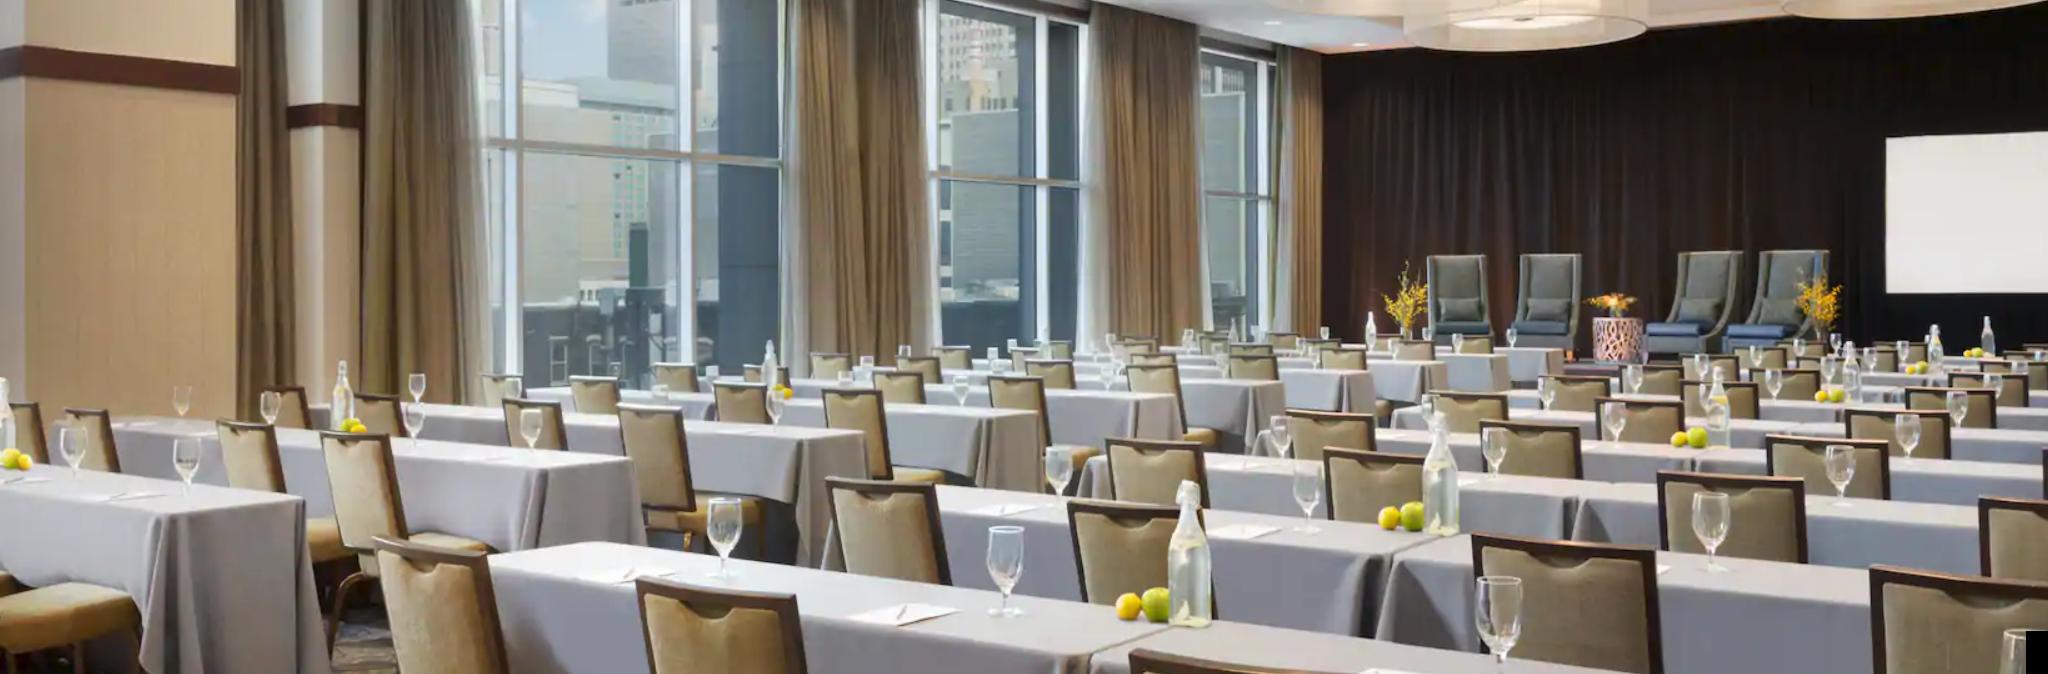 https://www.hotelsbyday.com/_data/default-hotel_image/4/20216/screenshot-2020-08-08-at-10-53-38-pm.png